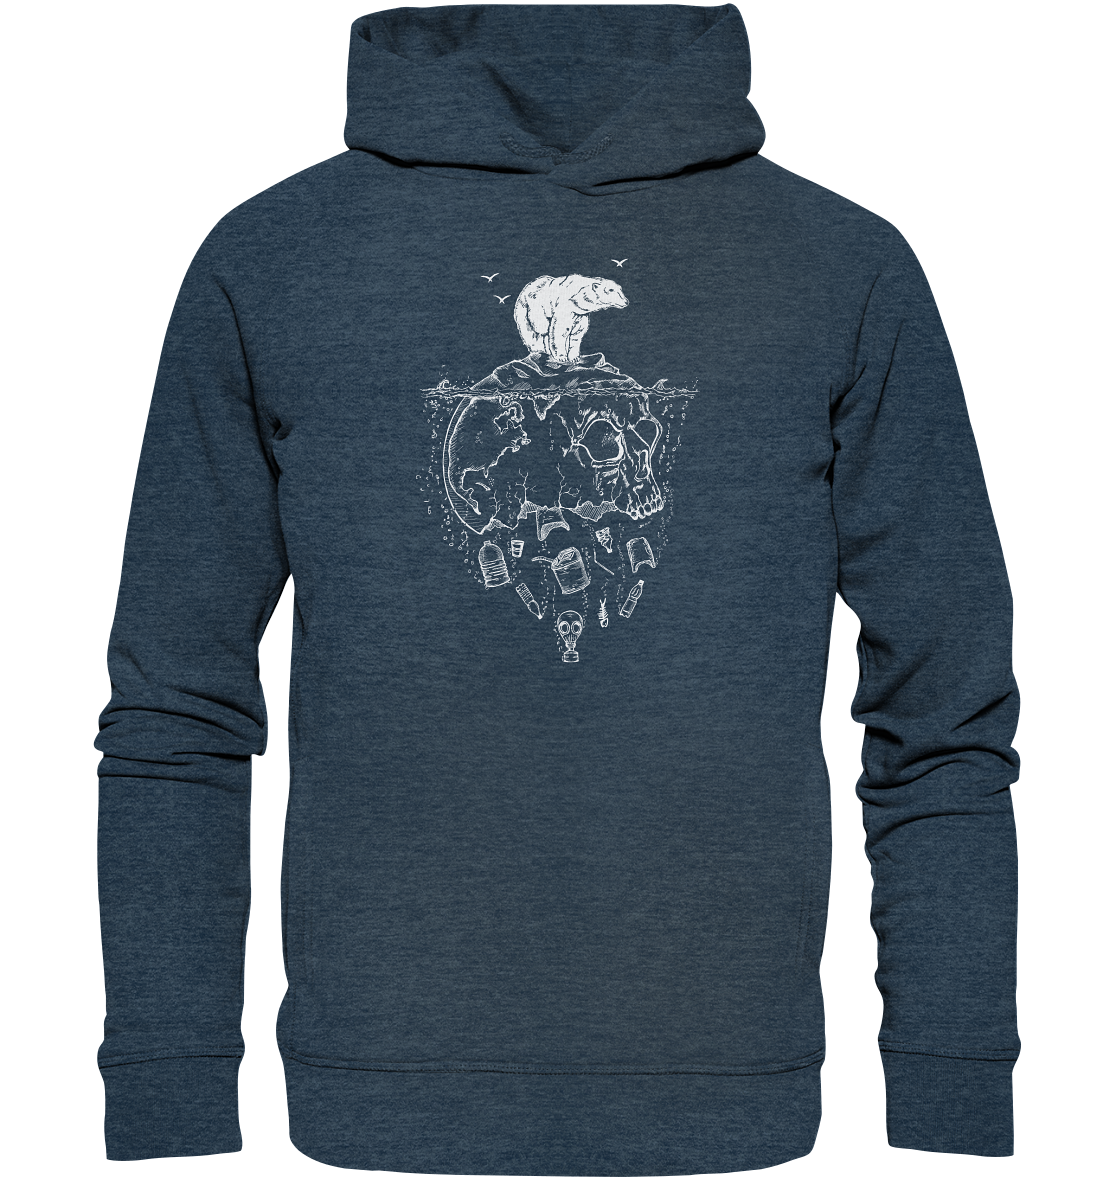 front-organic-fashion-hoodie-102940-1116x-5.png